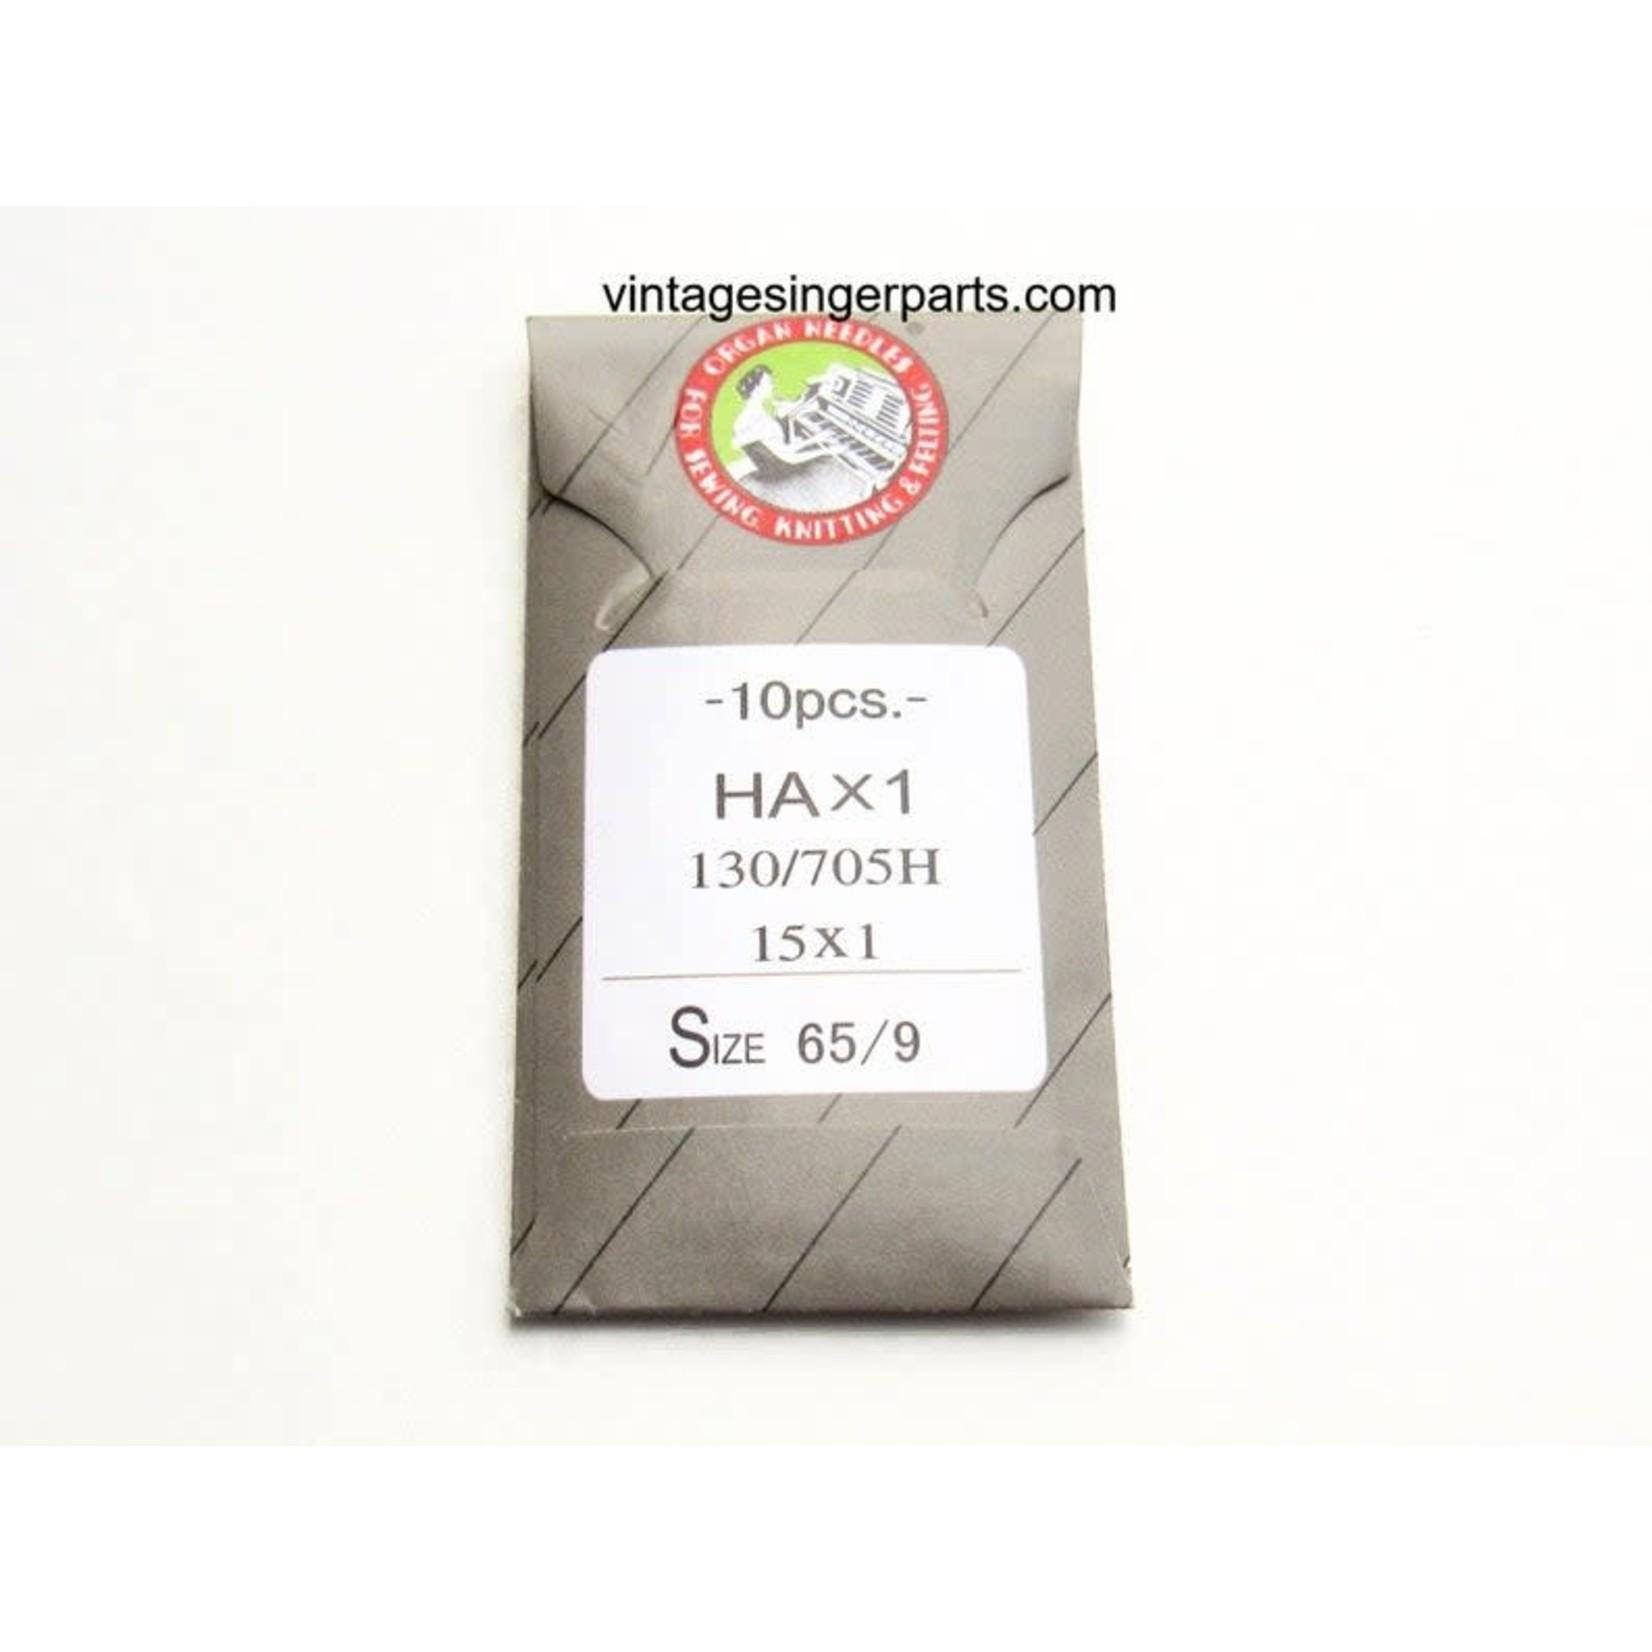 ORGAN HAx1 130/705H 15x1 #9/65 Regular Point Needle (10 pack)